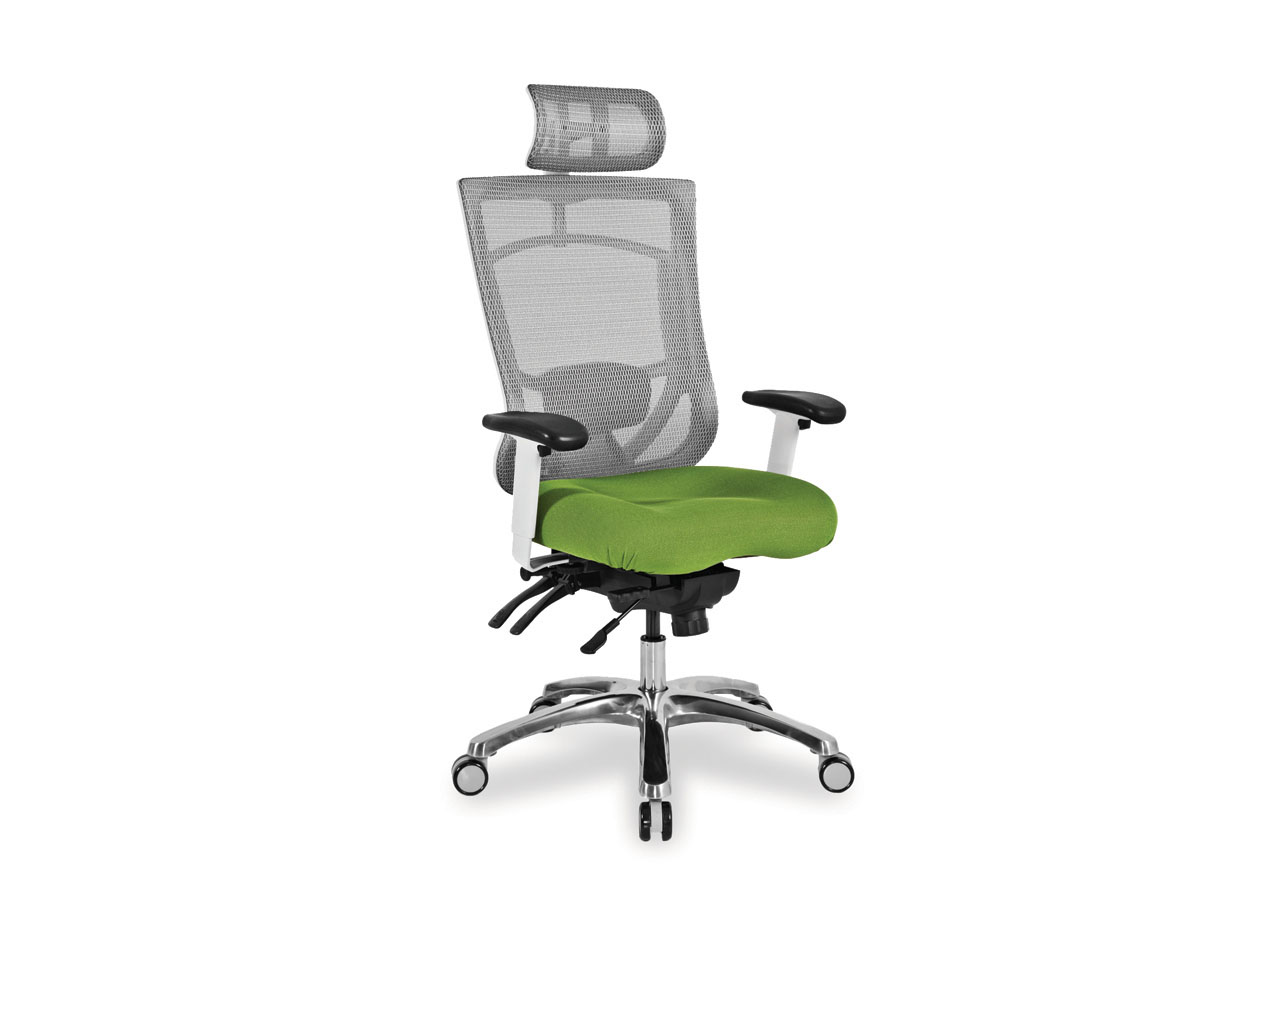 CoolMesh Pro Plus High Back Chair